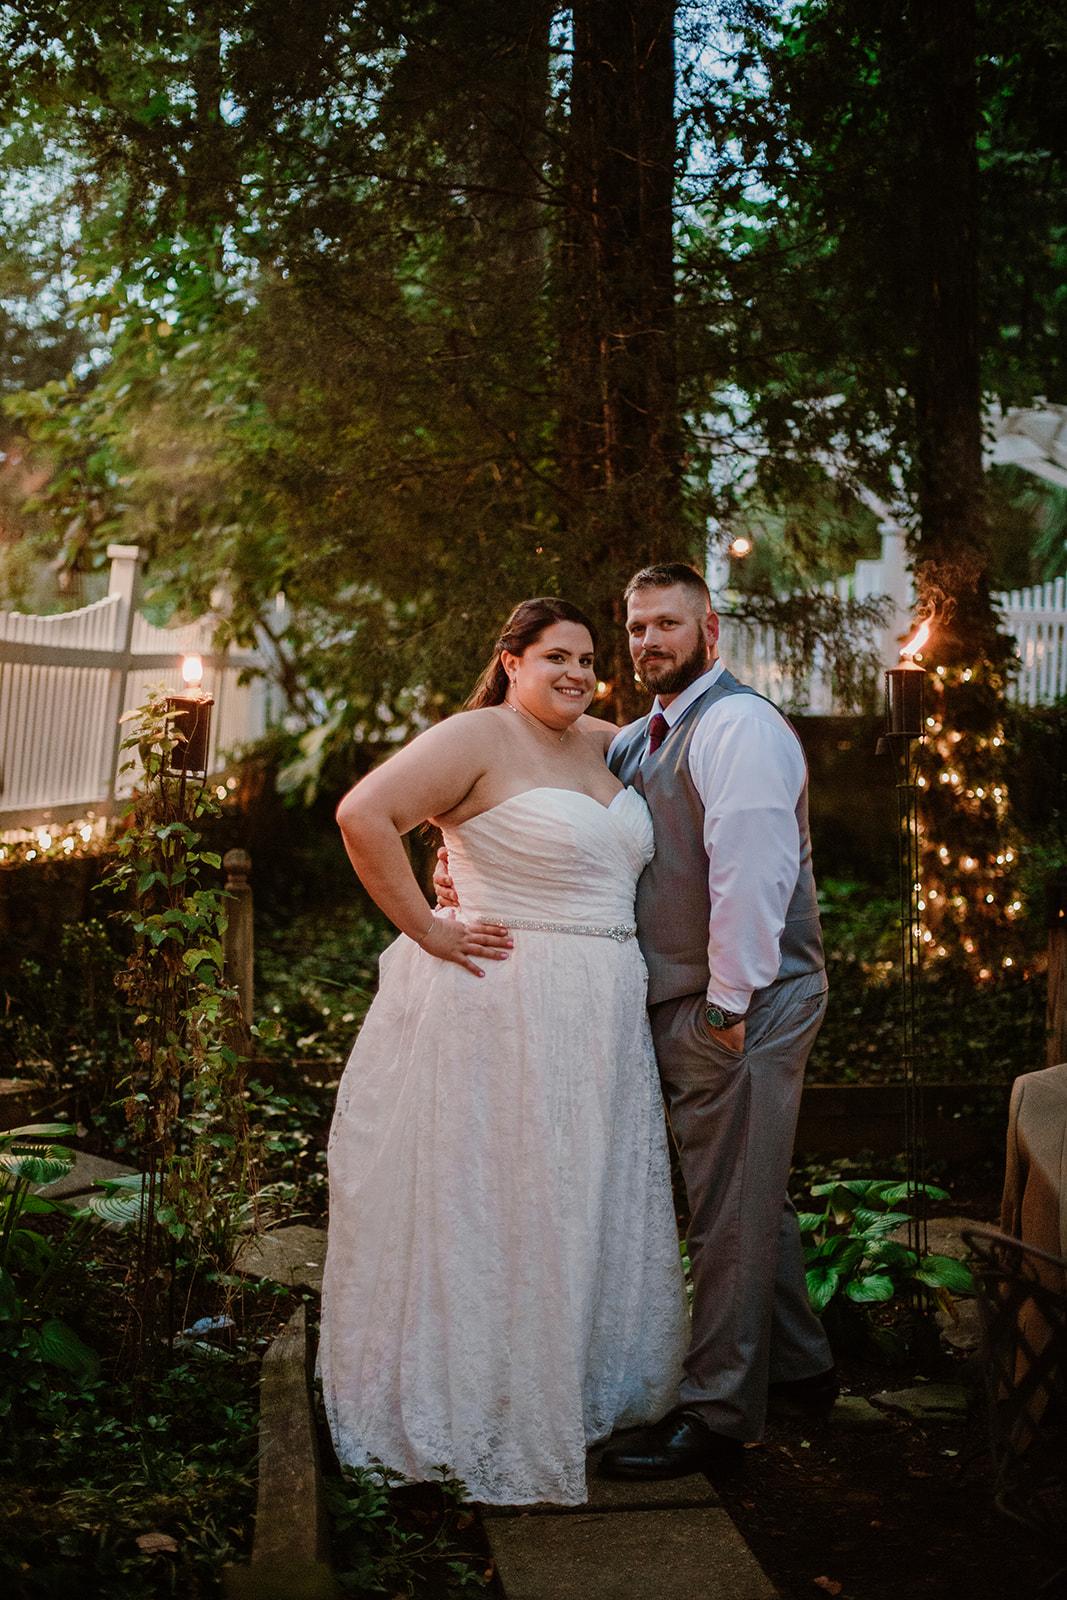 SarahMattozziPhotography-NicoleChris-GlenGardens-Reception-20.jpg